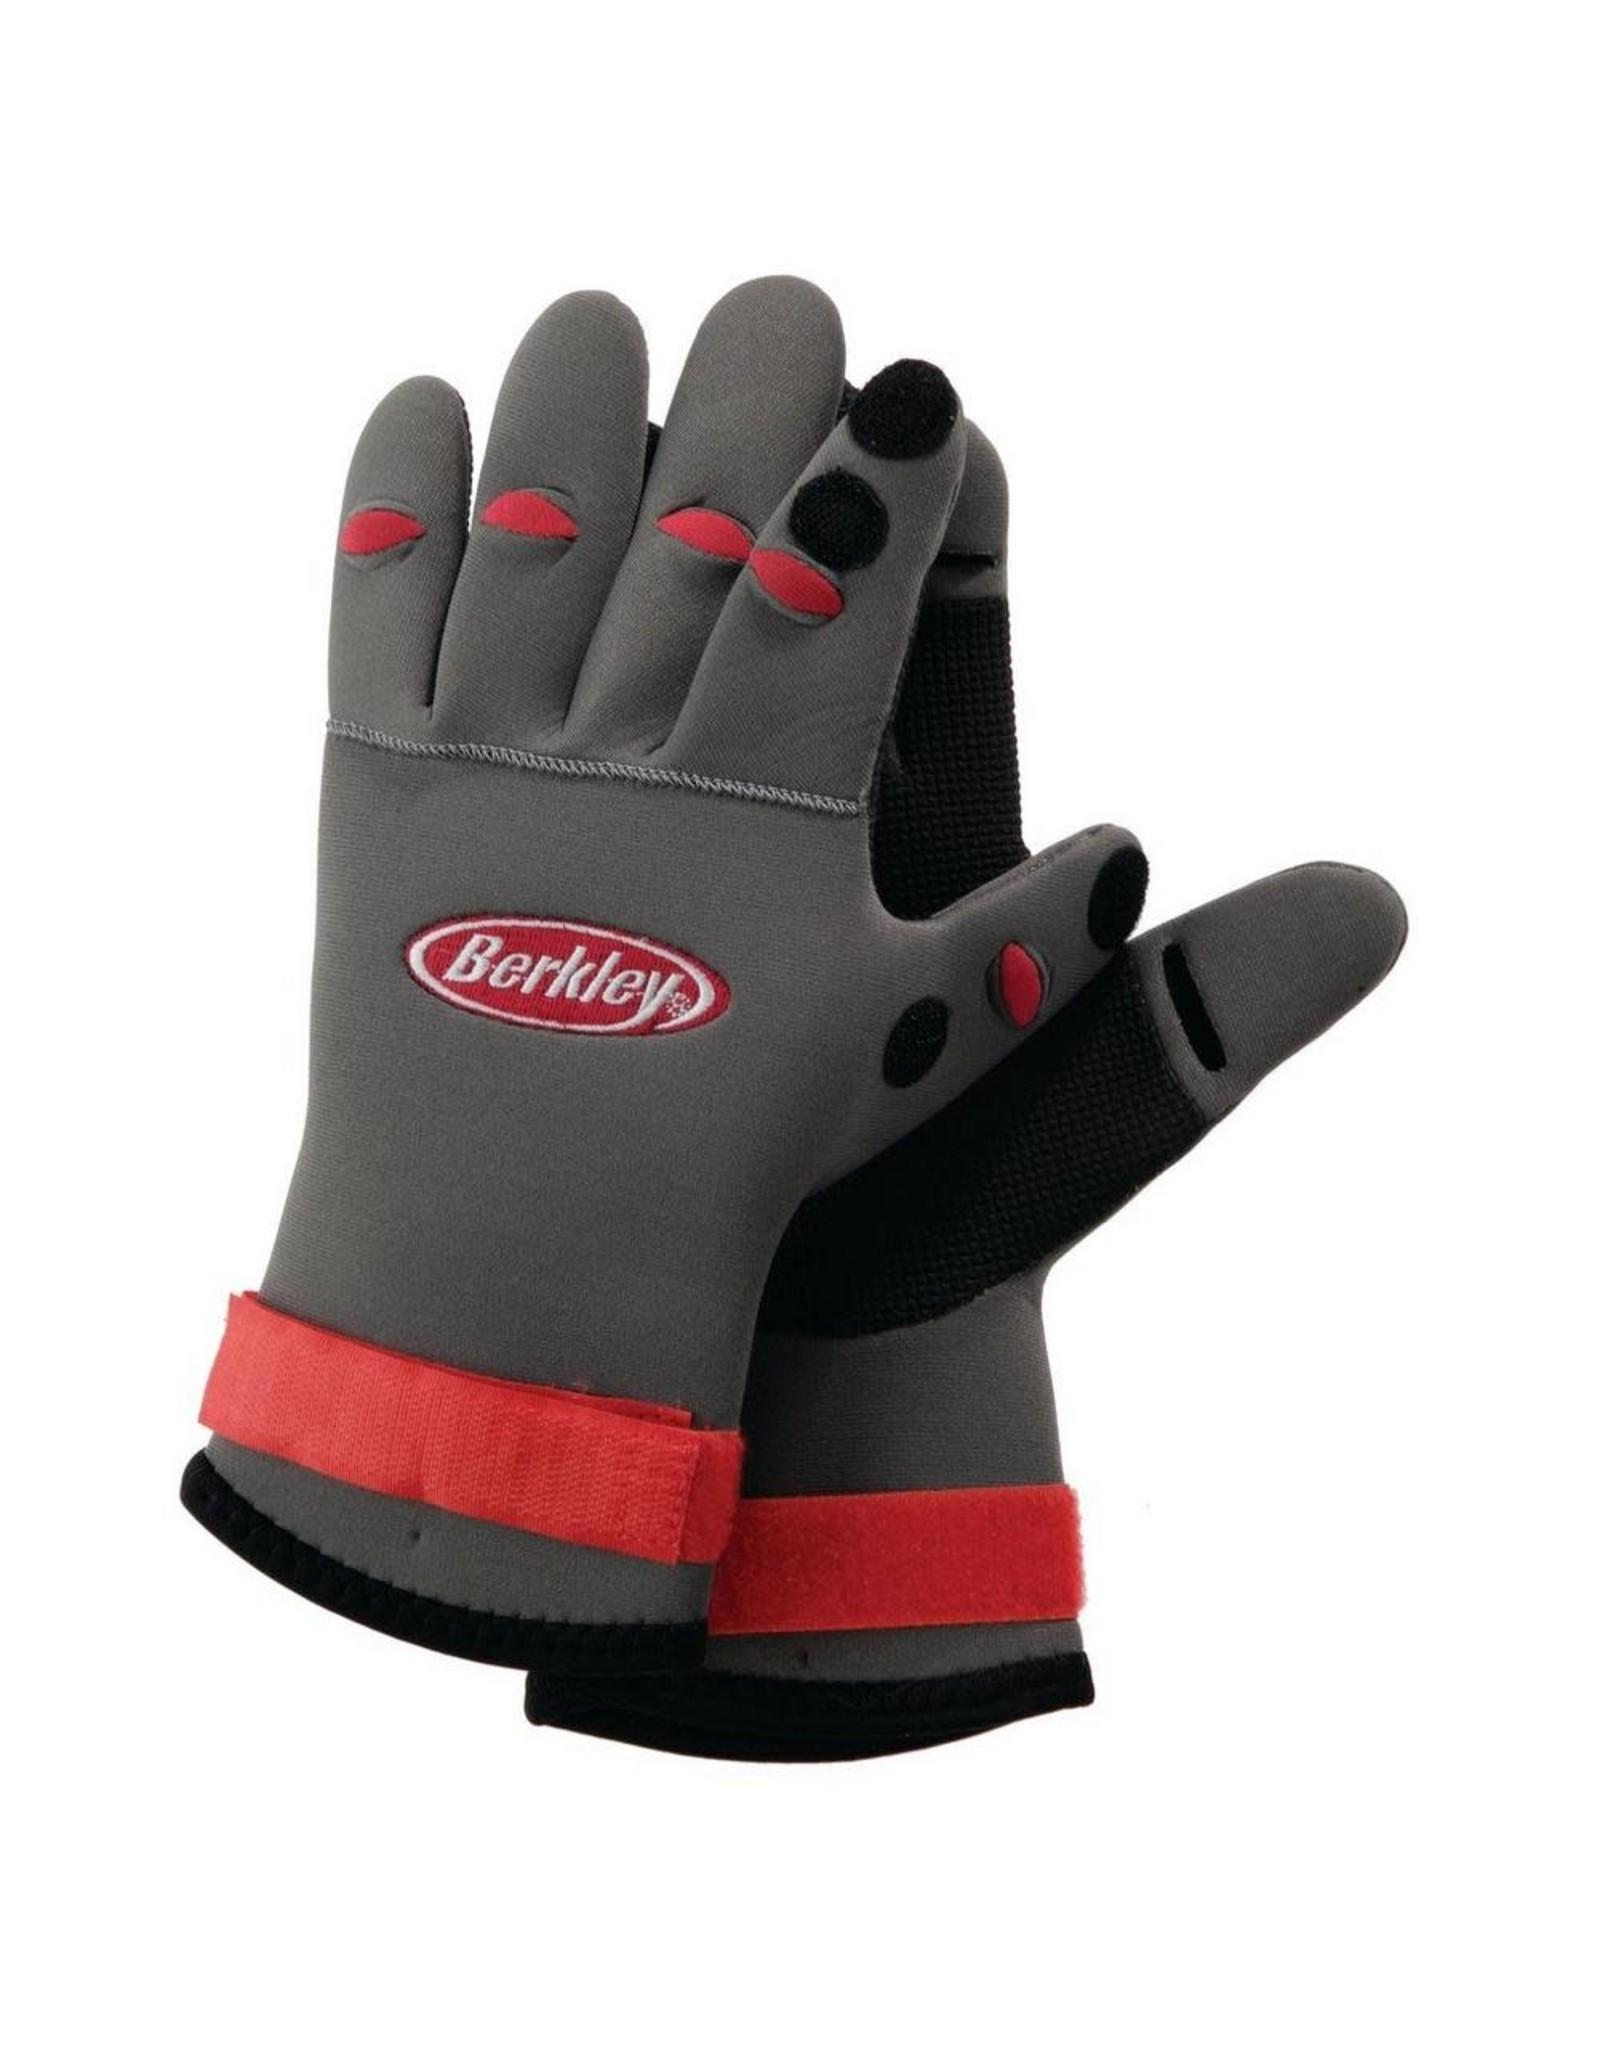 Berkley Fishing Berkley Neoprene Fish Grip Gloves